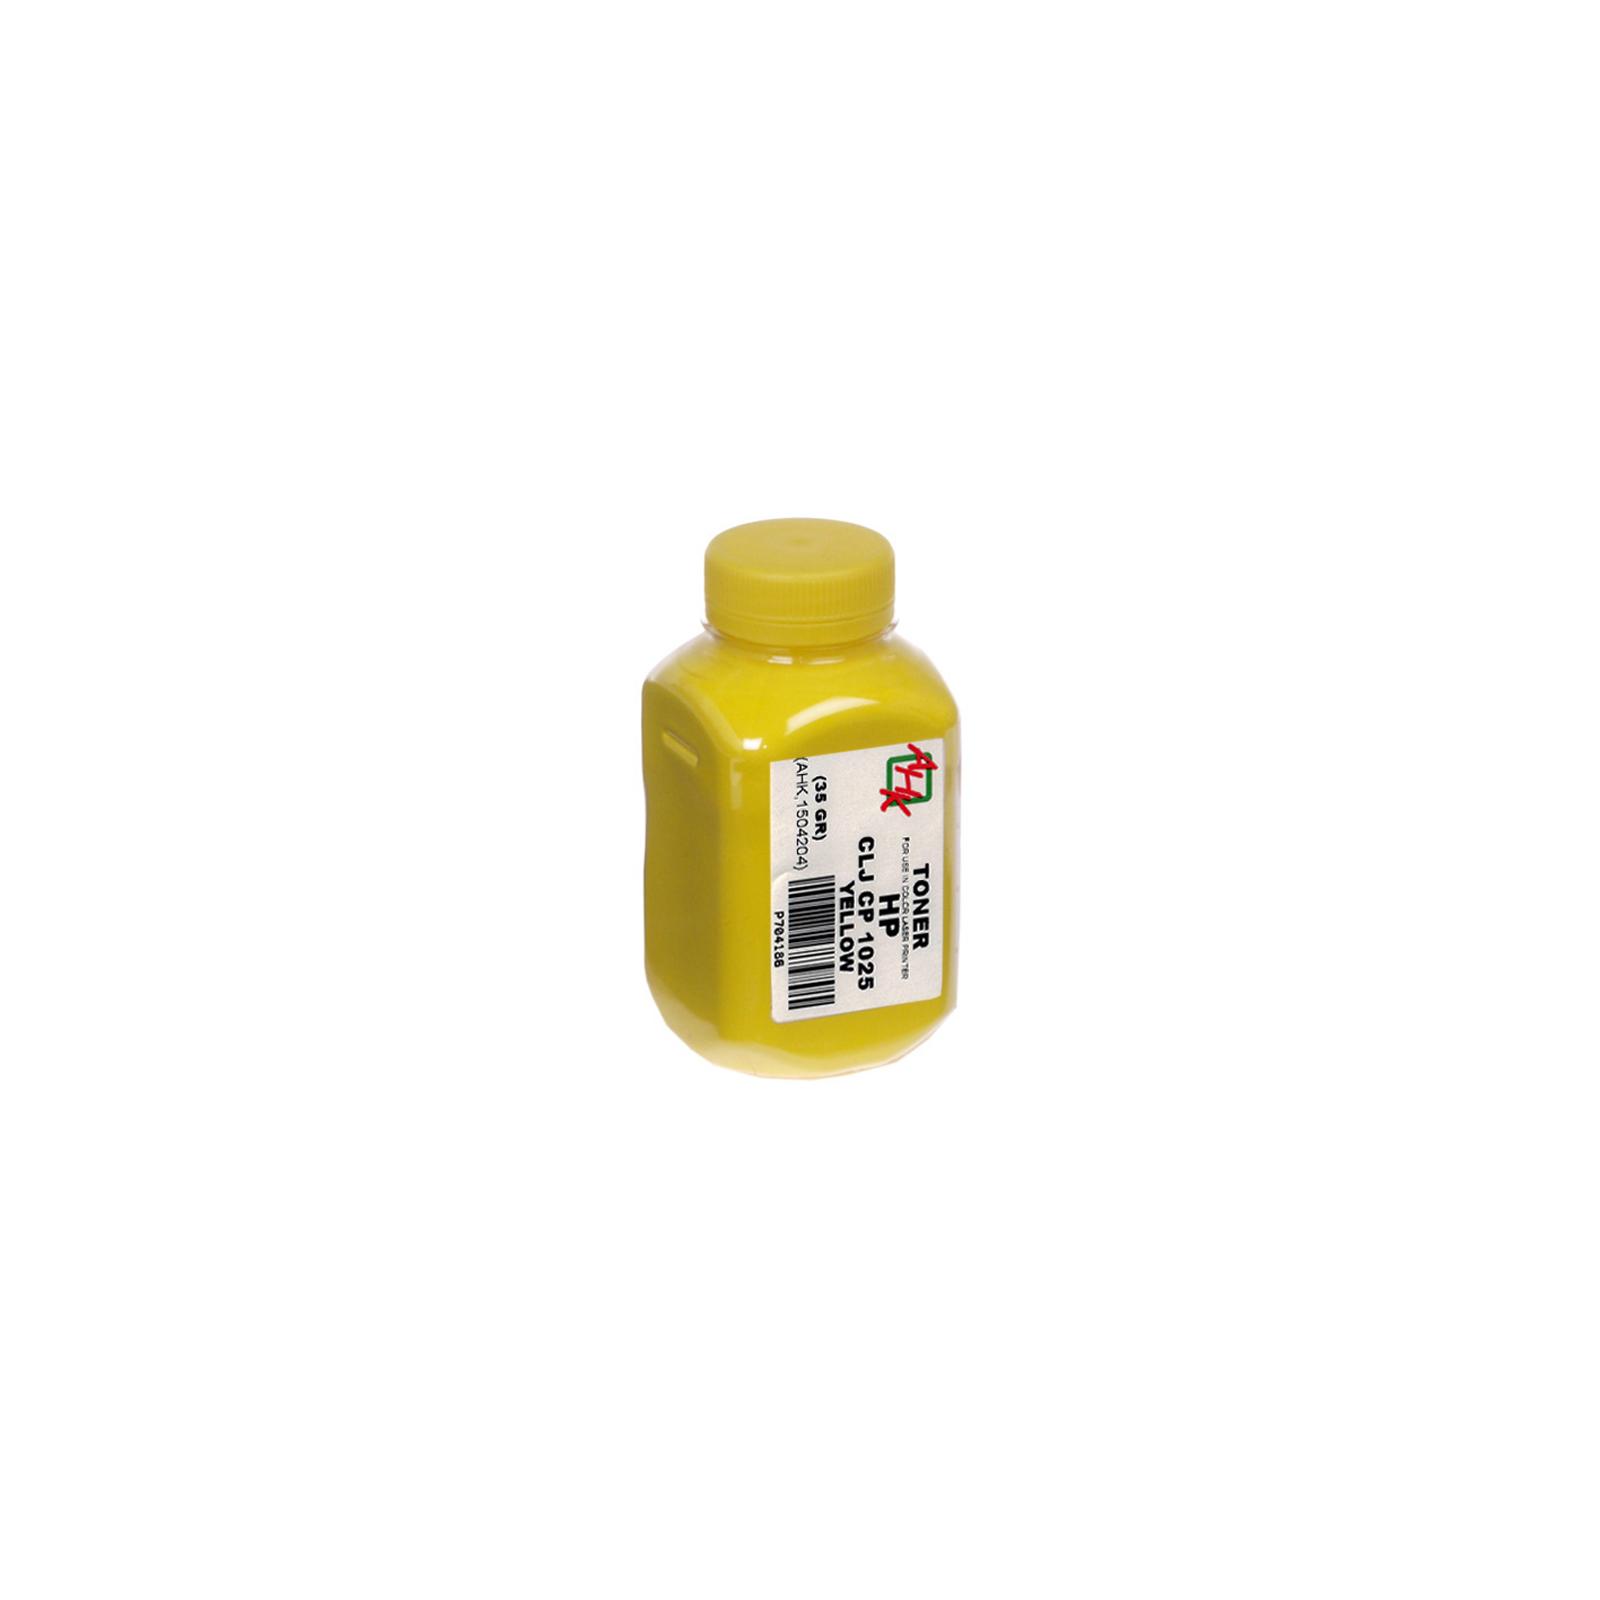 Тонер HP CLJ CP1025 Yellow AHK (1504204)